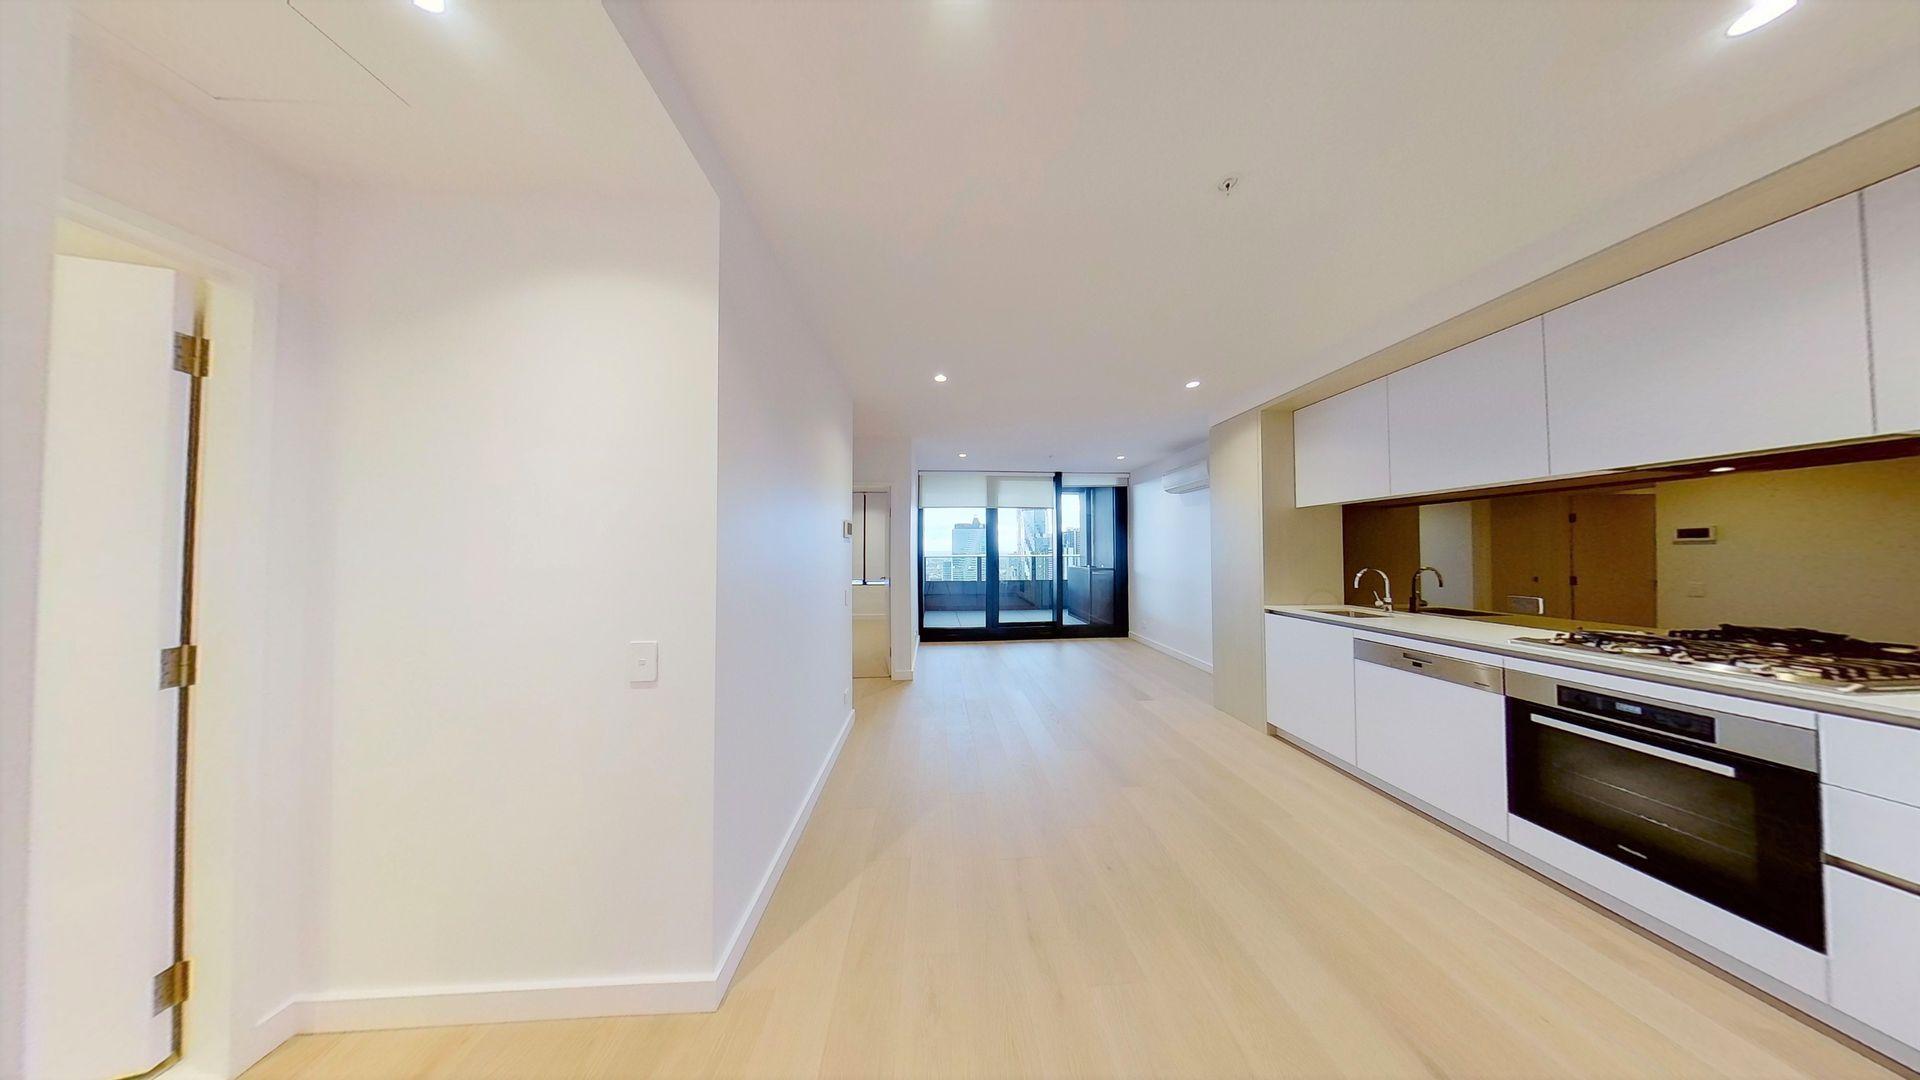 2 bedrooms Apartment / Unit / Flat in 3717/628 Flinders Street DOCKLANDS VIC, 3008